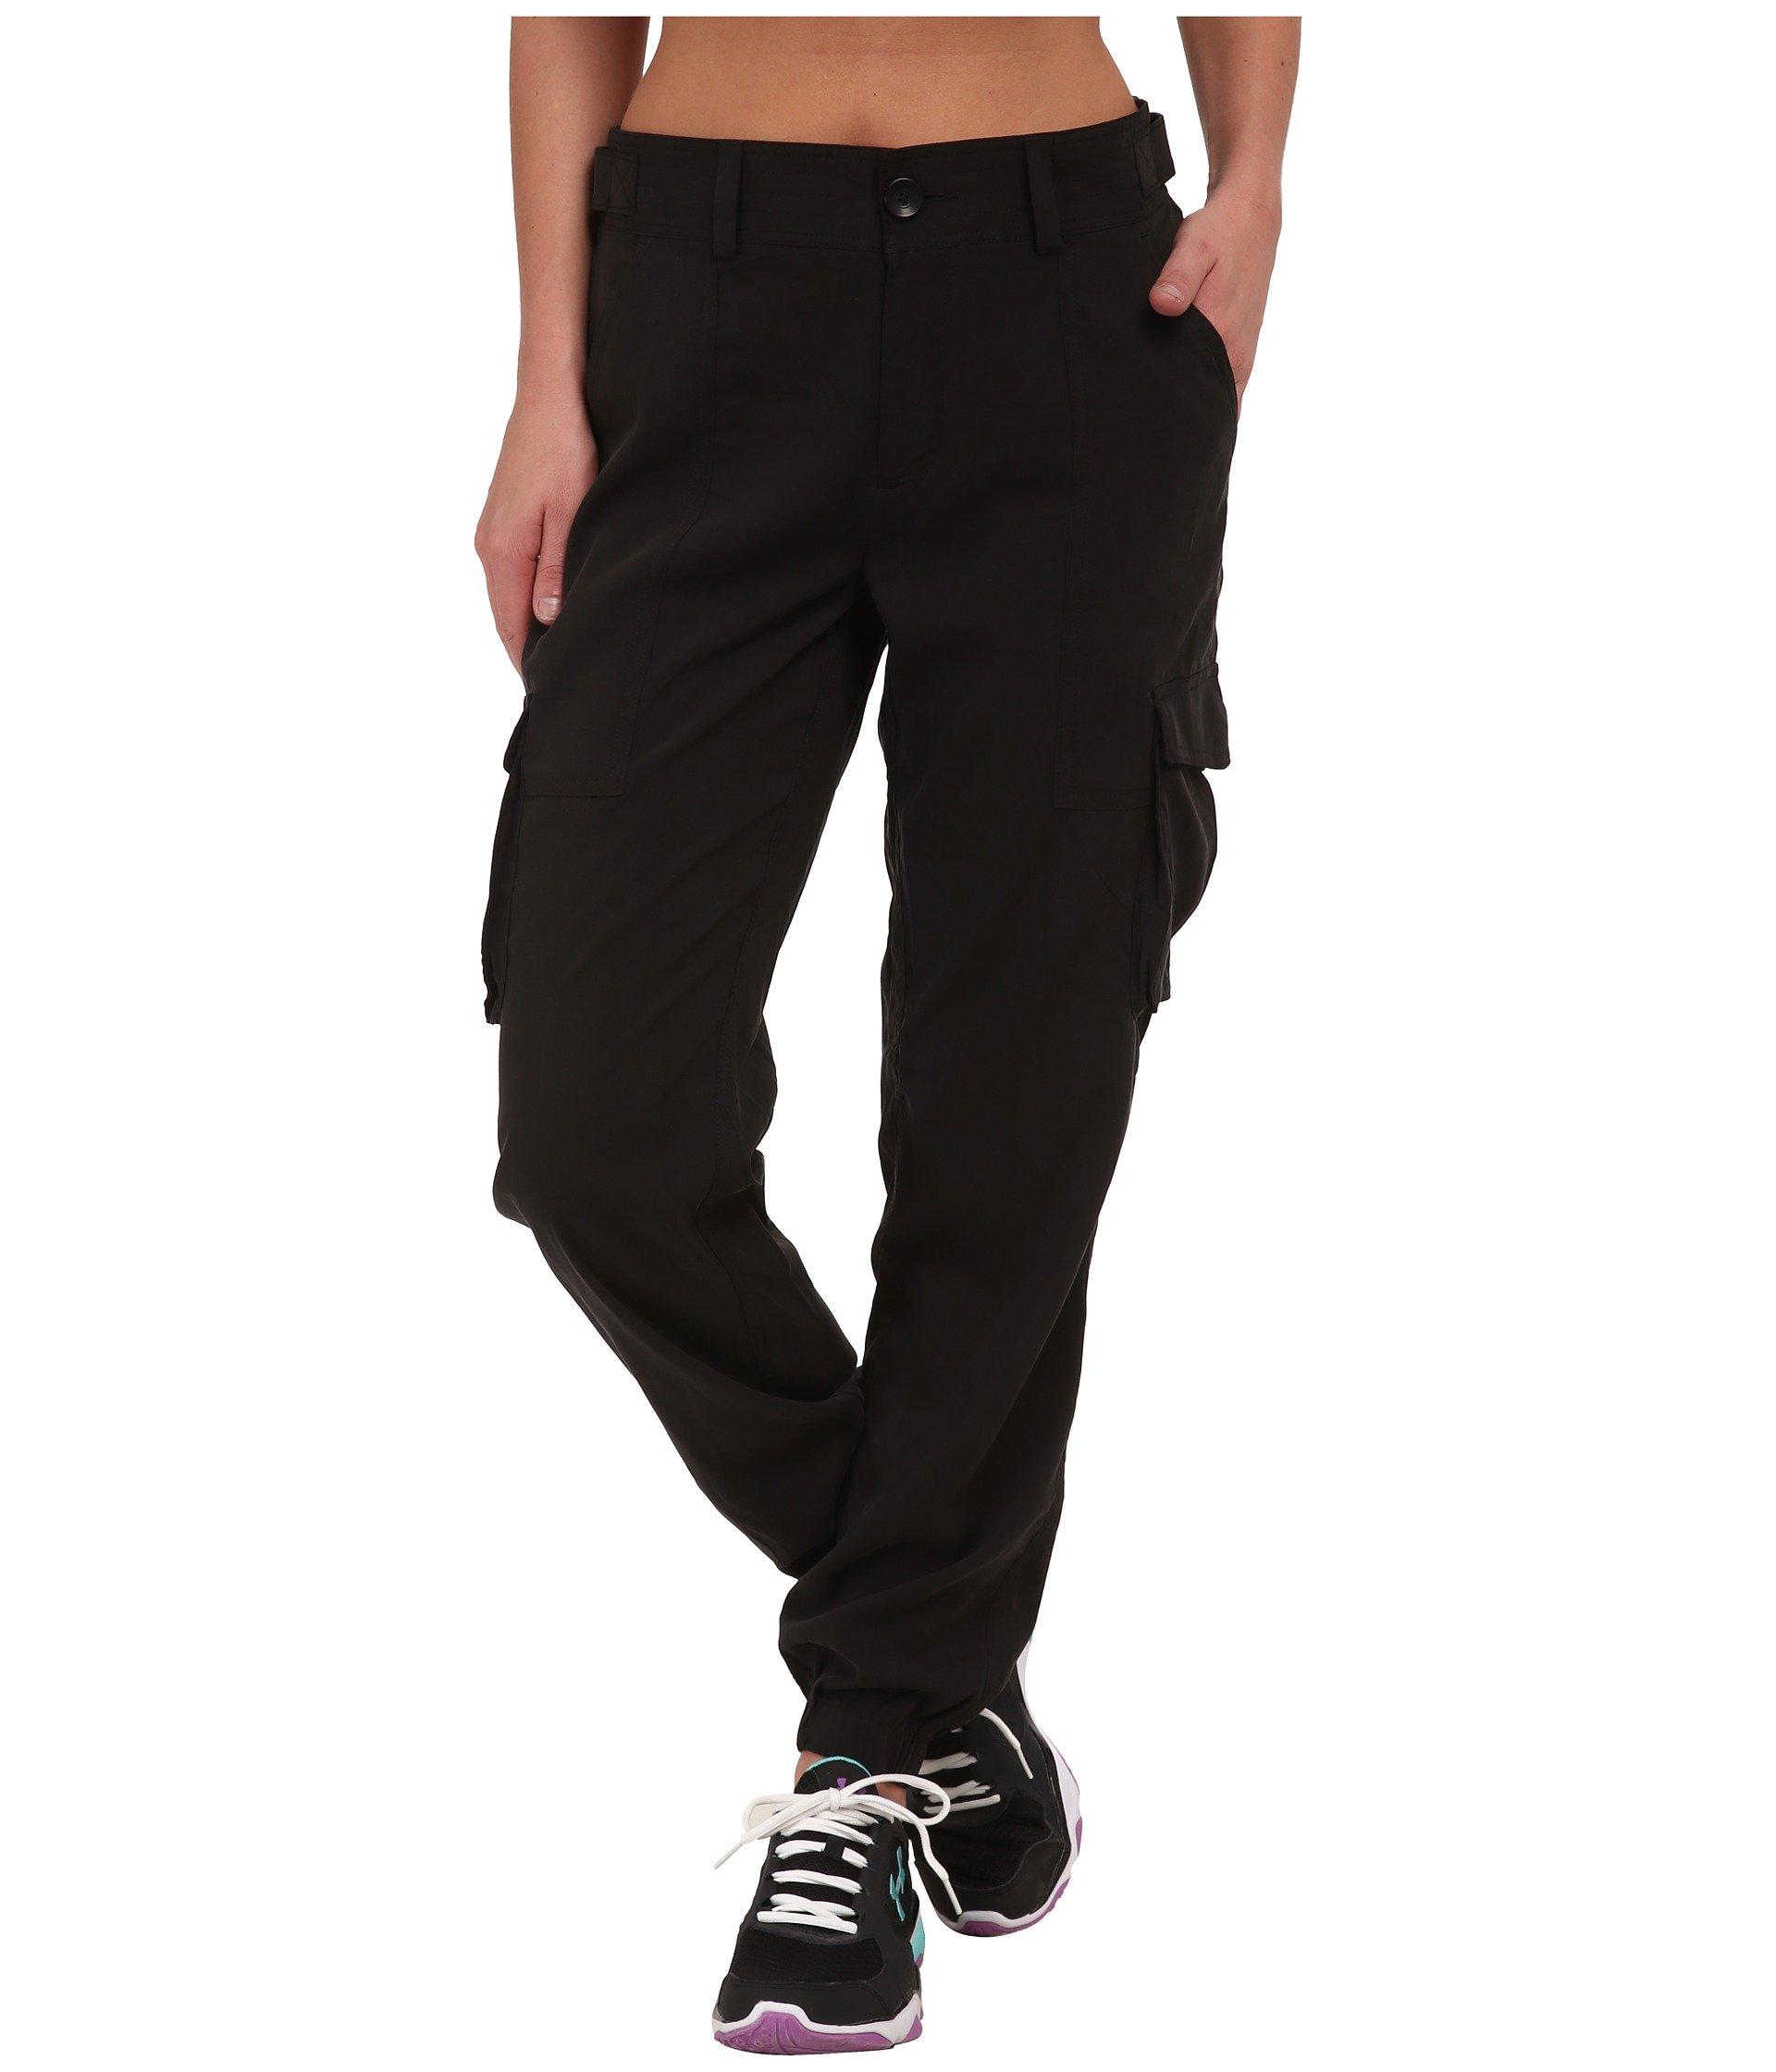 Under Armour Womens UA Slim Air Woven Cargo Pants Large Black